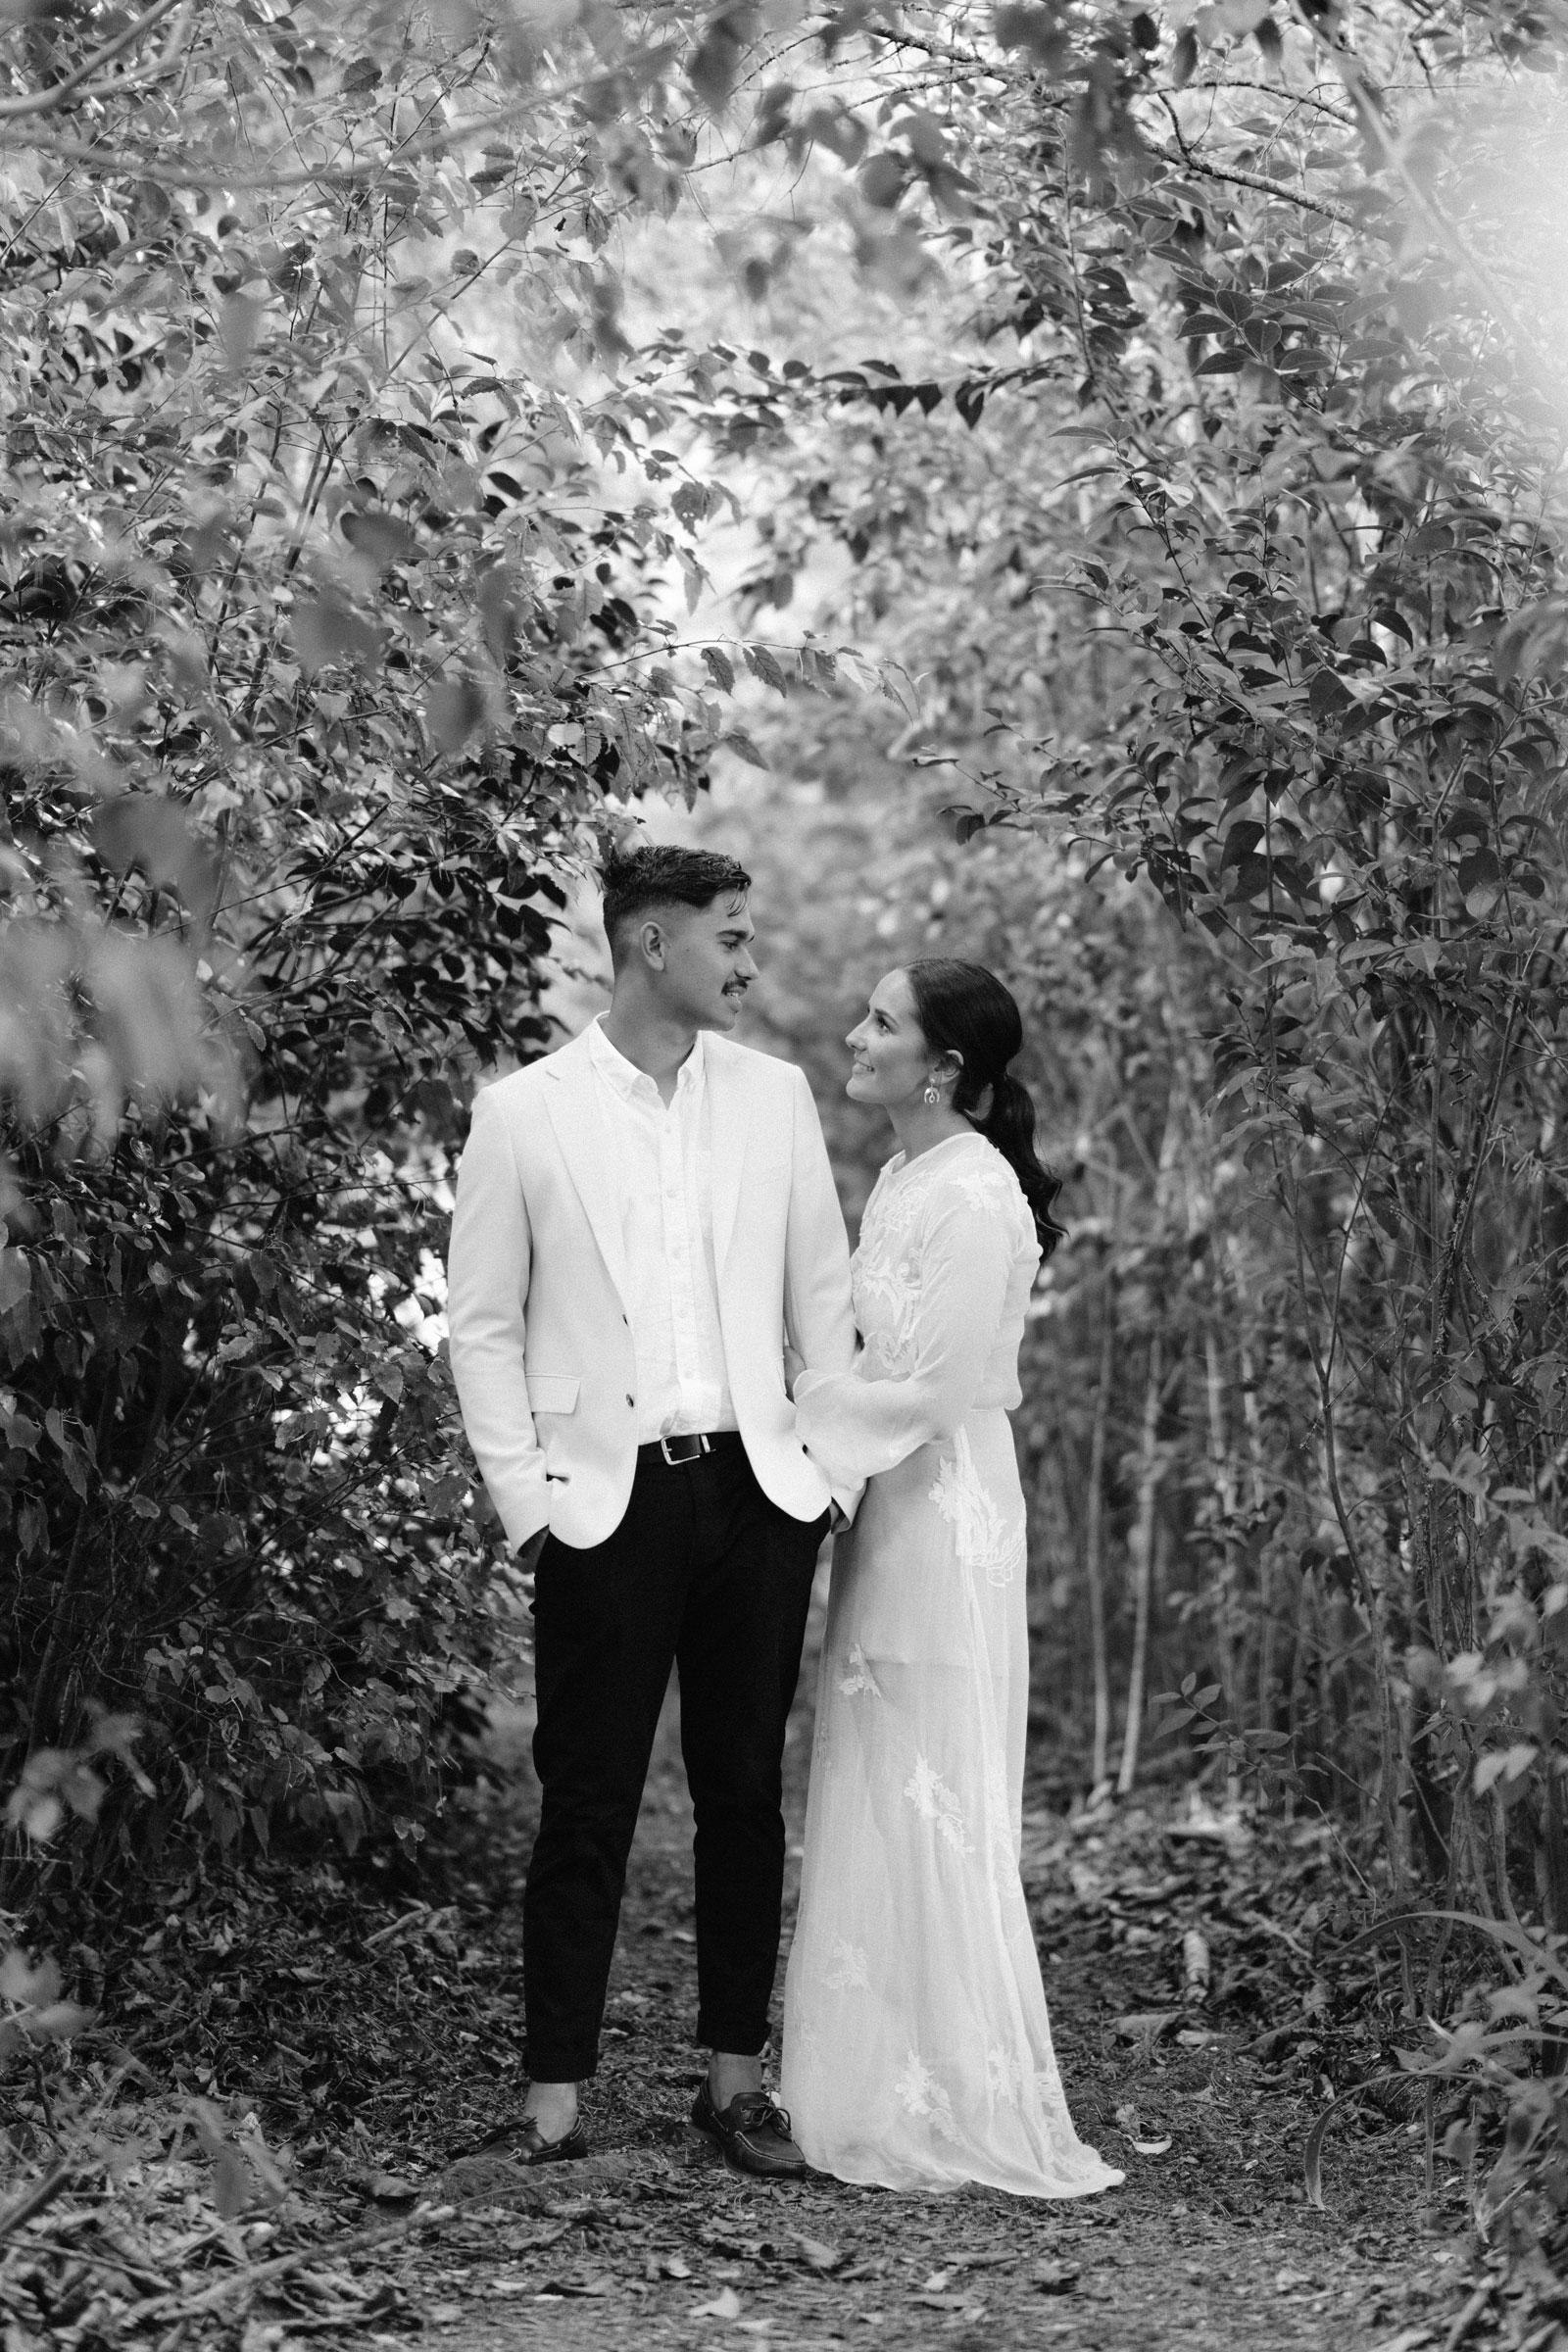 newfound-s-t-hunua-auckland-wedding-photographers-068